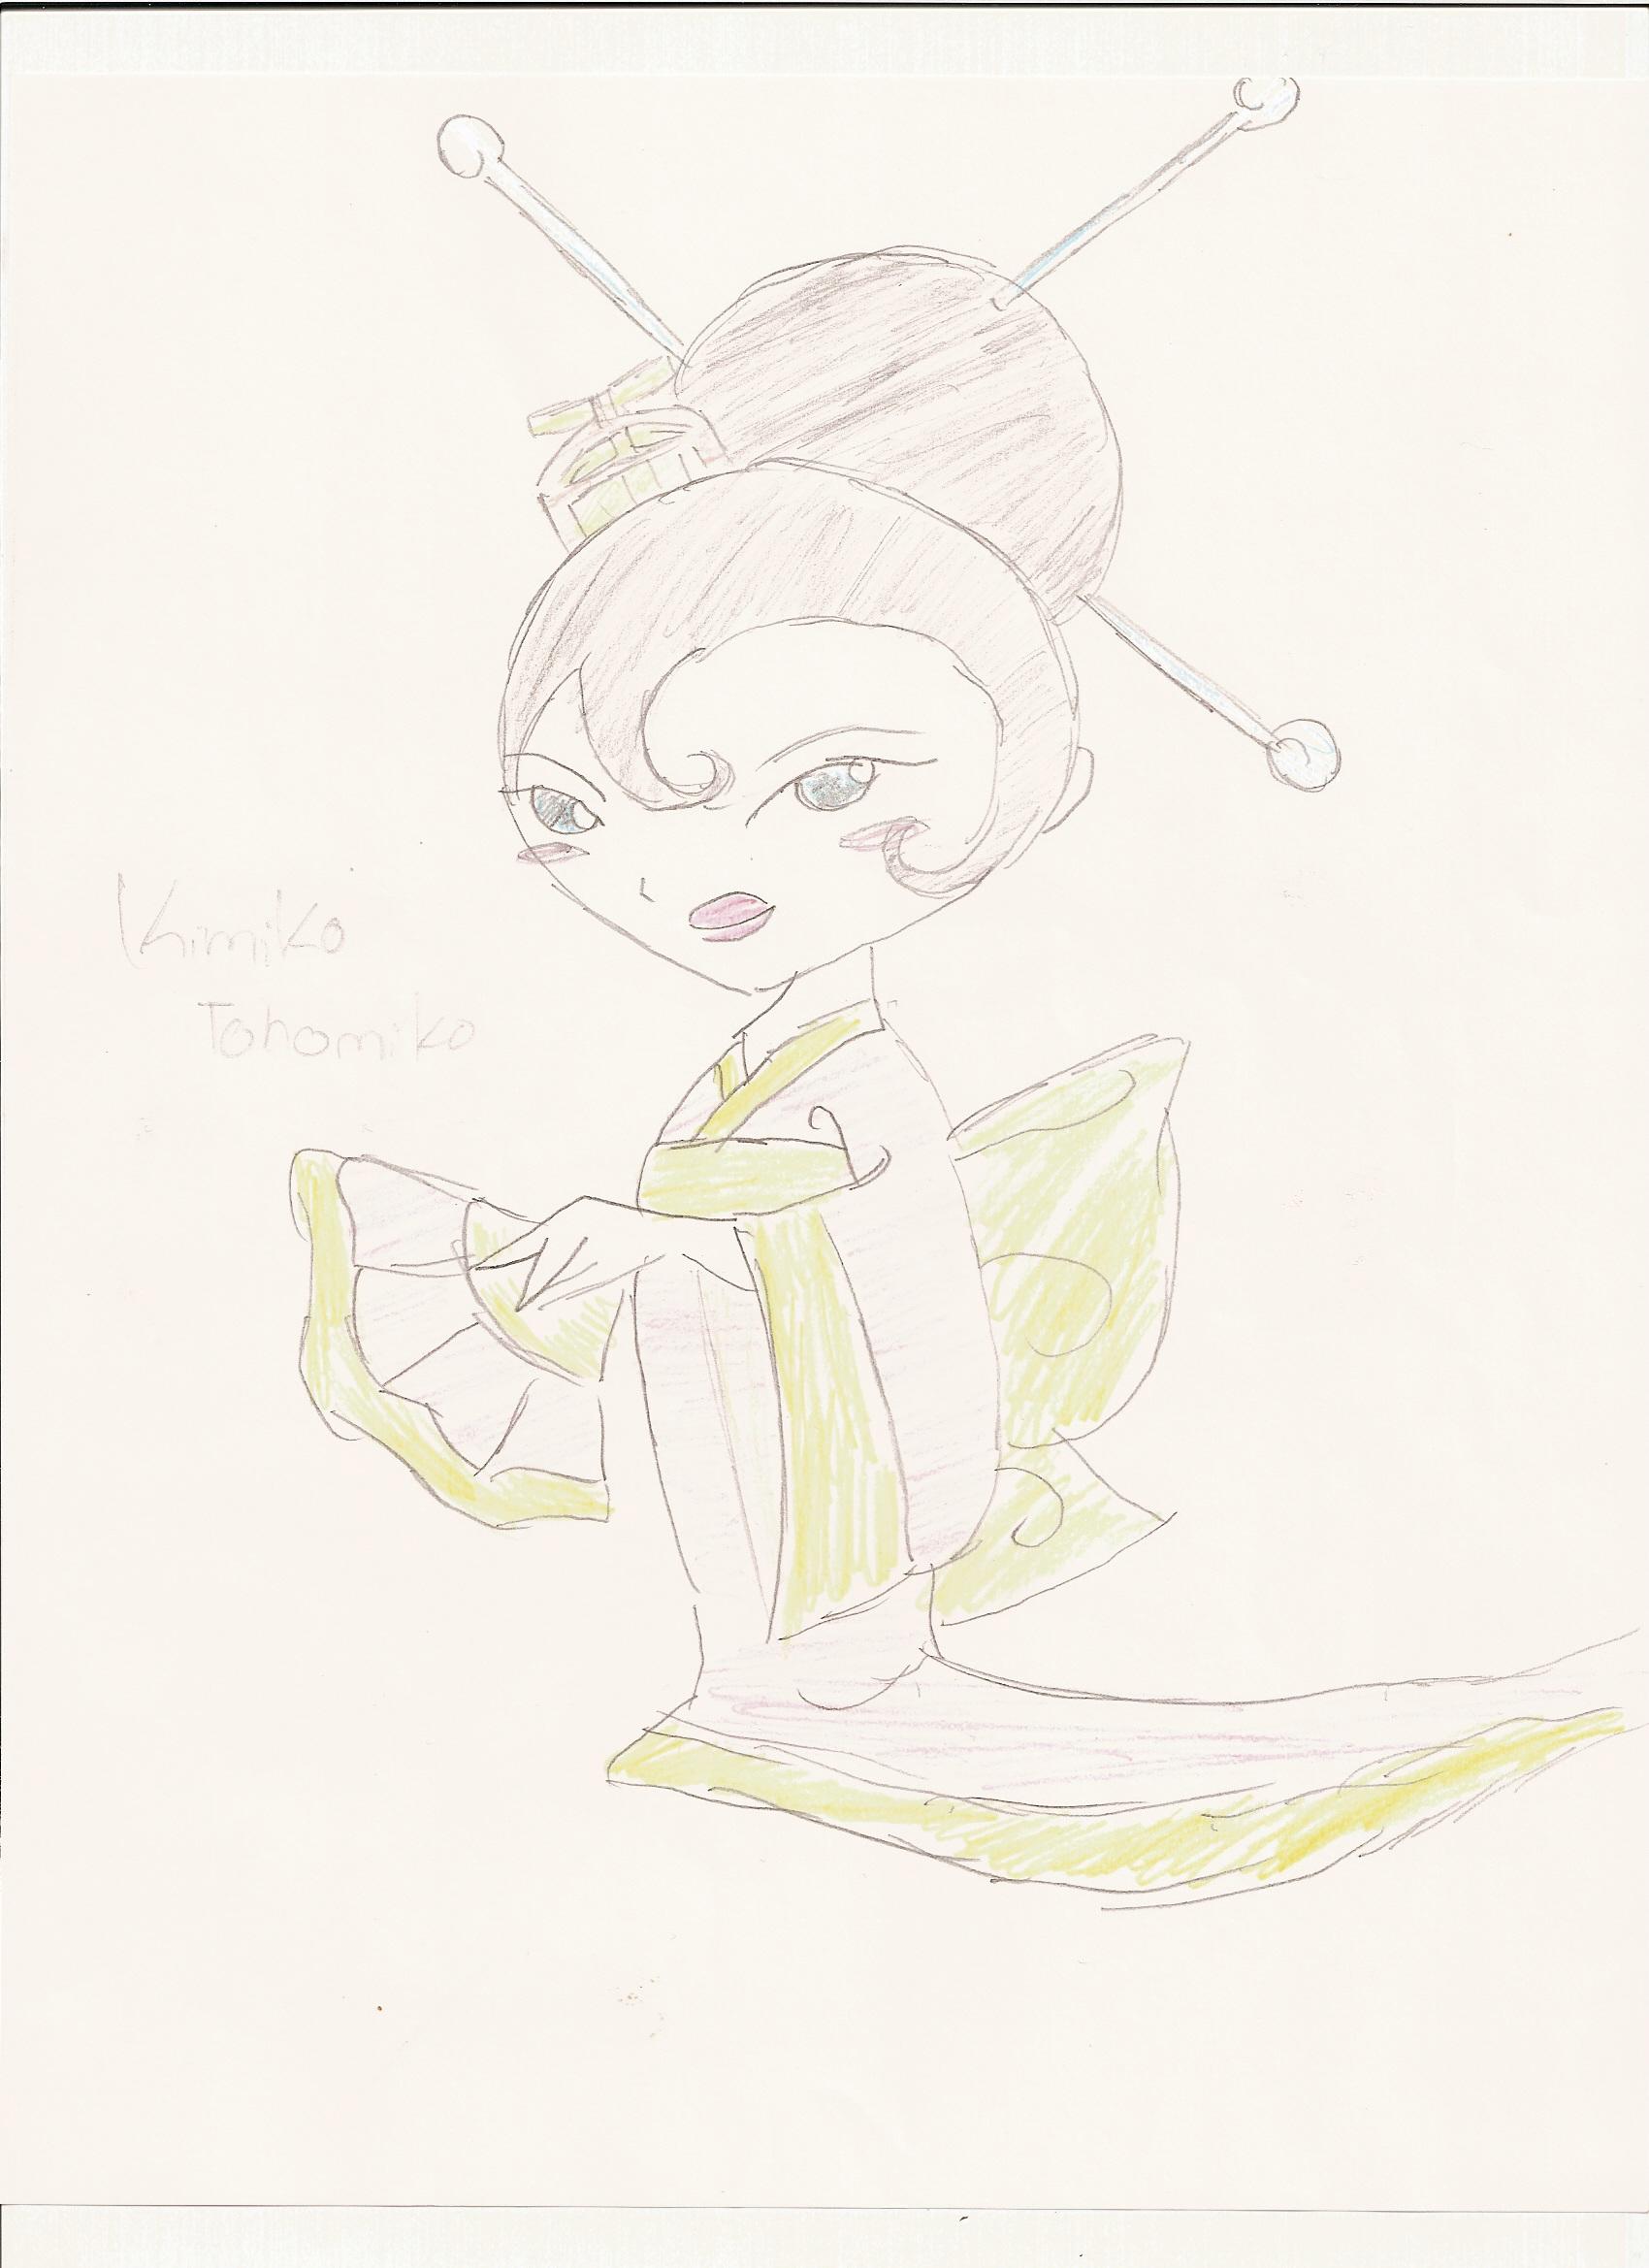 kimOno by Kimikoprincesspancho